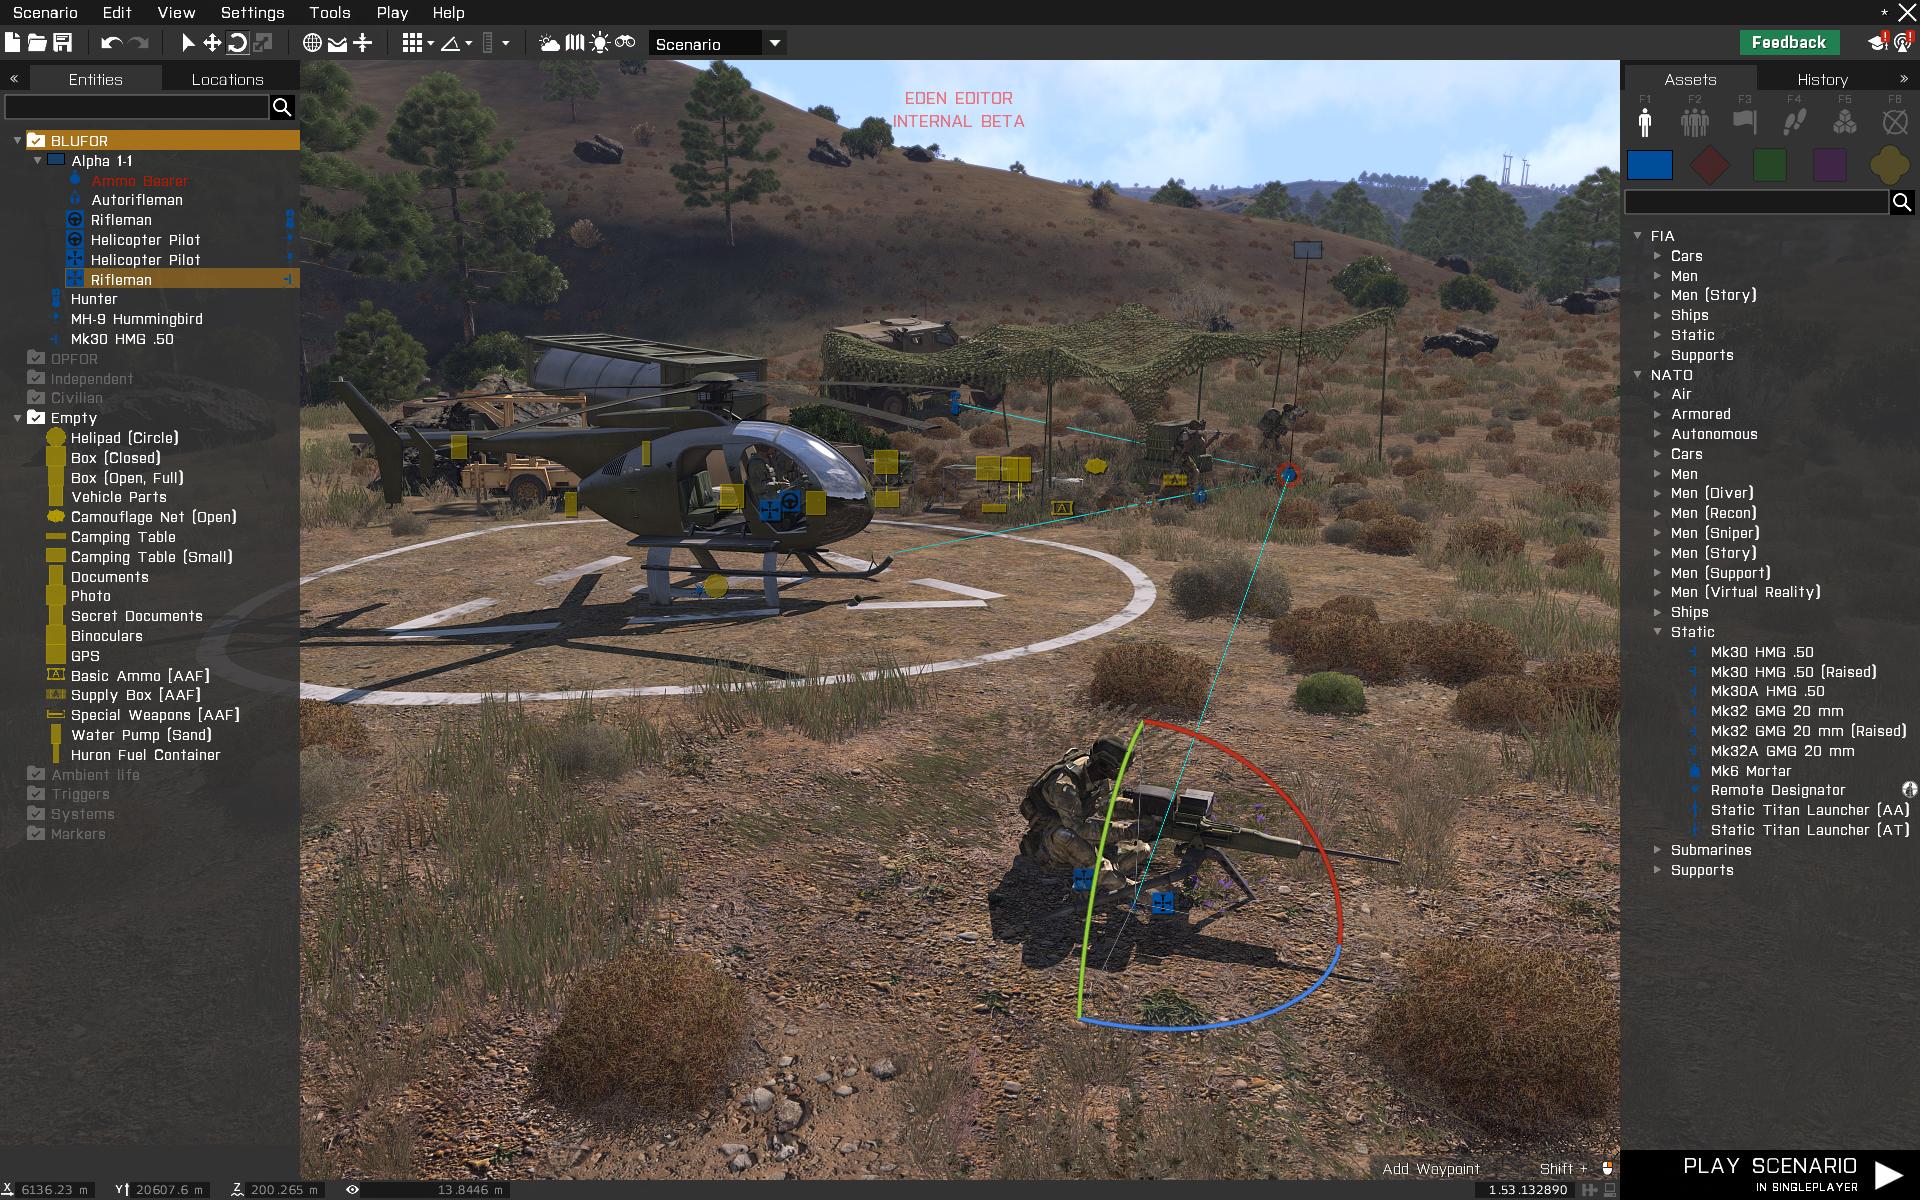 Arma 3, Arma III, Bohemia Interactive, Apex, 2015-2016 roadmap, Eden